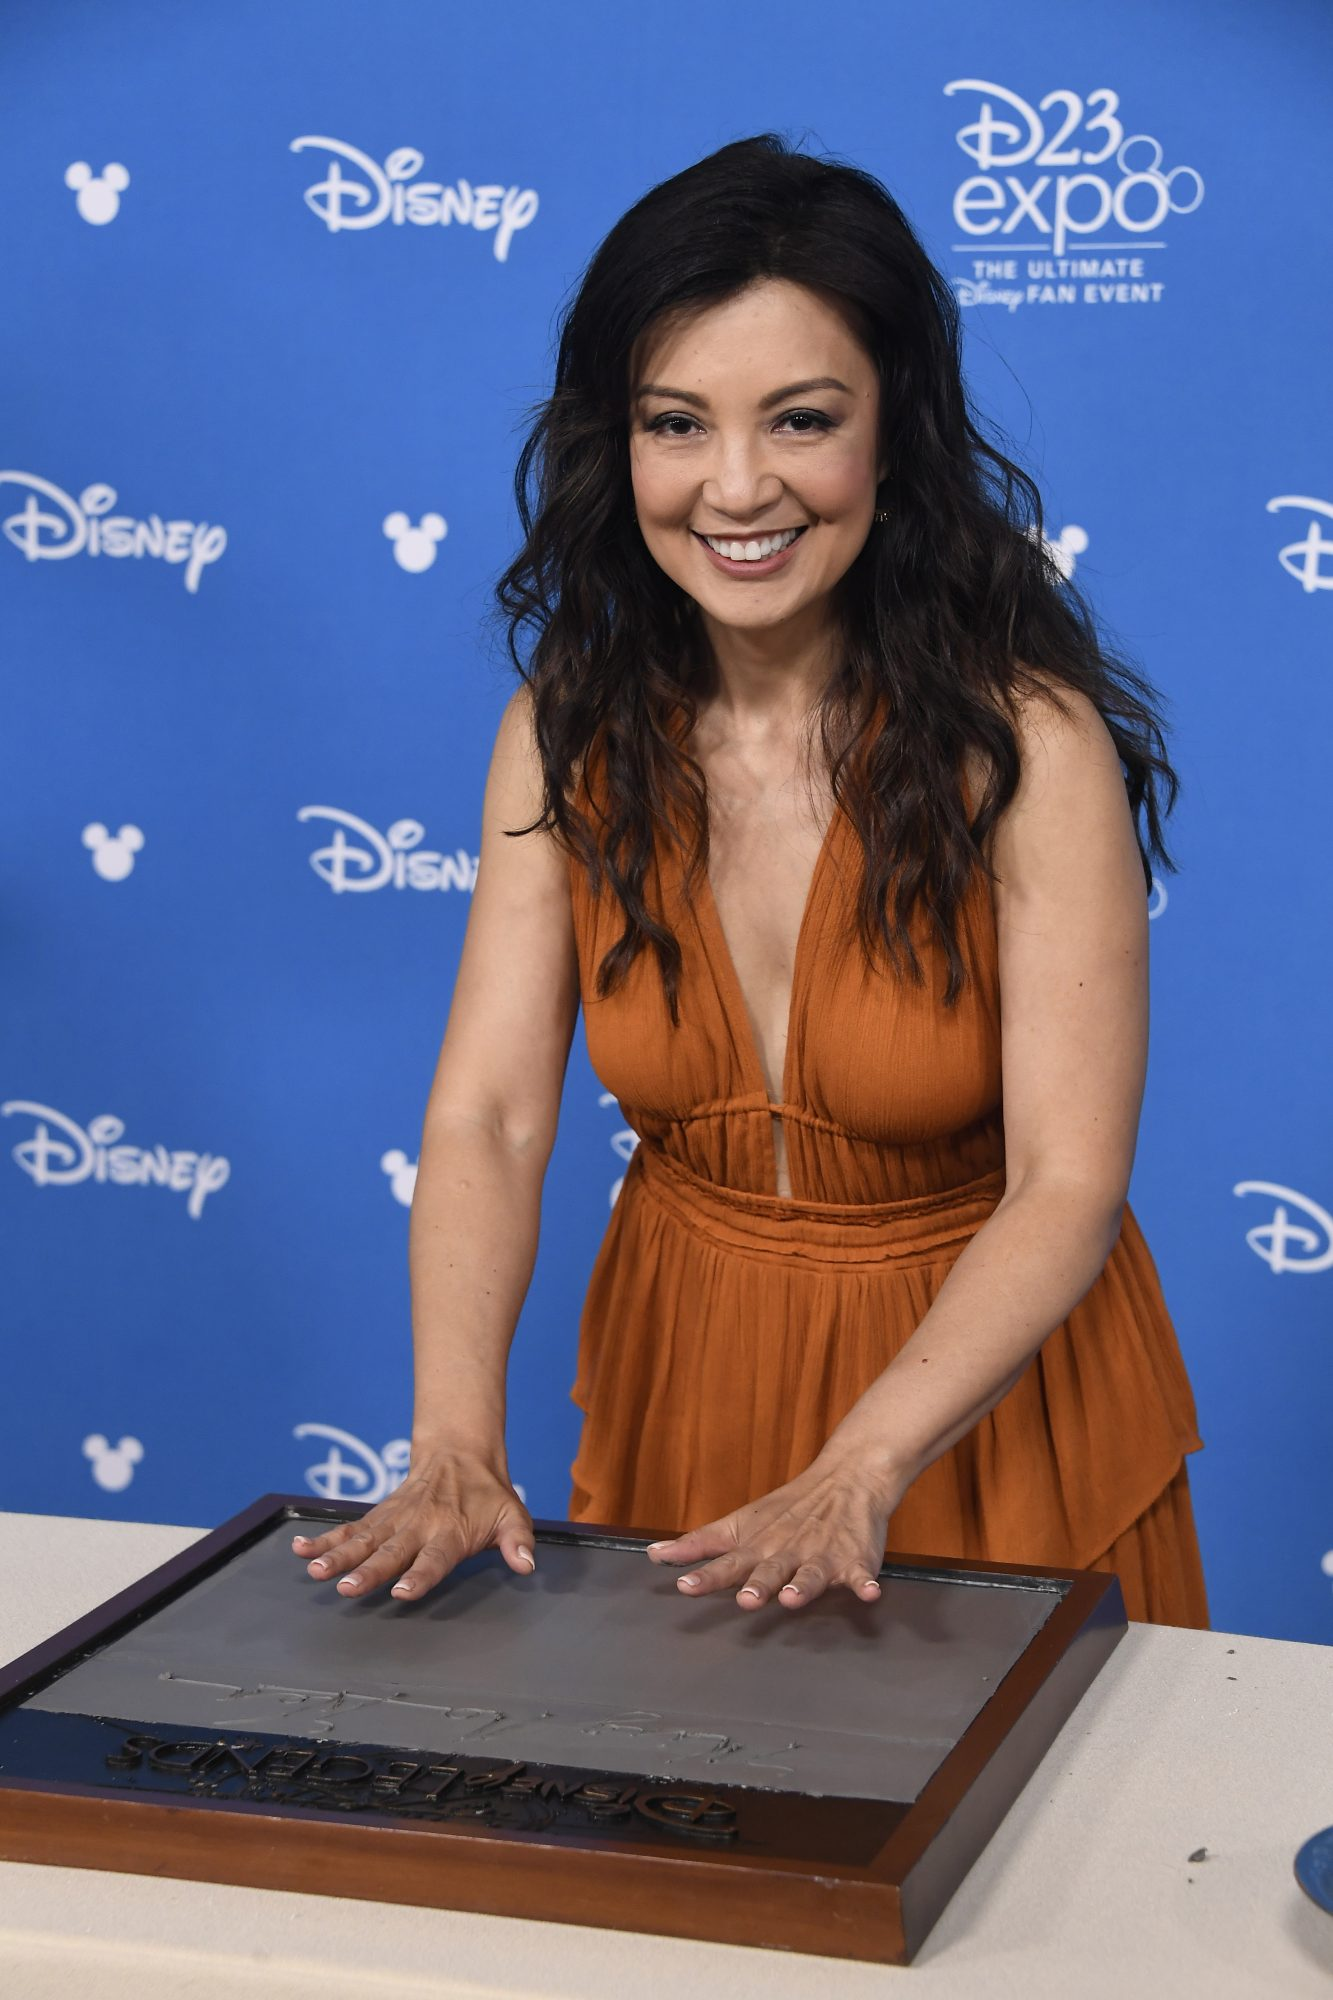 ANAHEIM, CALIFORNIA - AUGUST 23:Ming-Na Wen, attends D23 Disney Legends event at Anaheim Convention Center on August 23, 2019 in Anaheim, California. (Photo by Frazer Harrison/Getty Images)